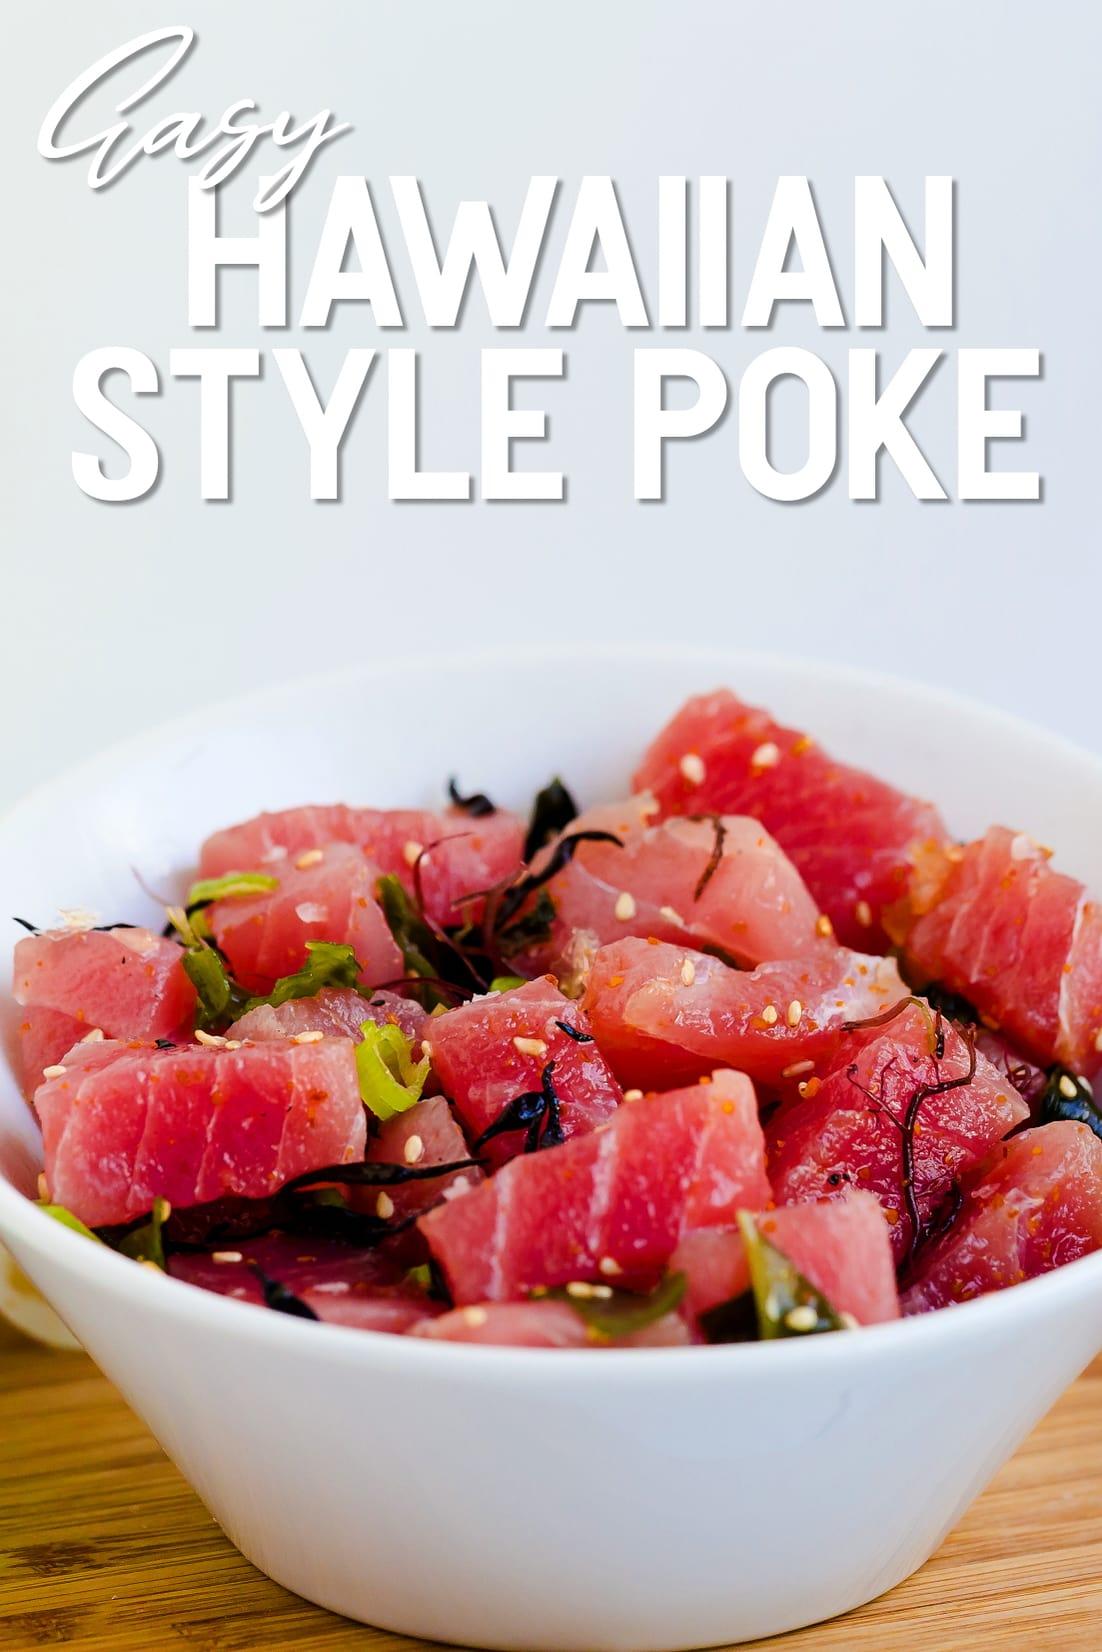 Best Hawaiian Authentic Ahi Poke in a white bowl